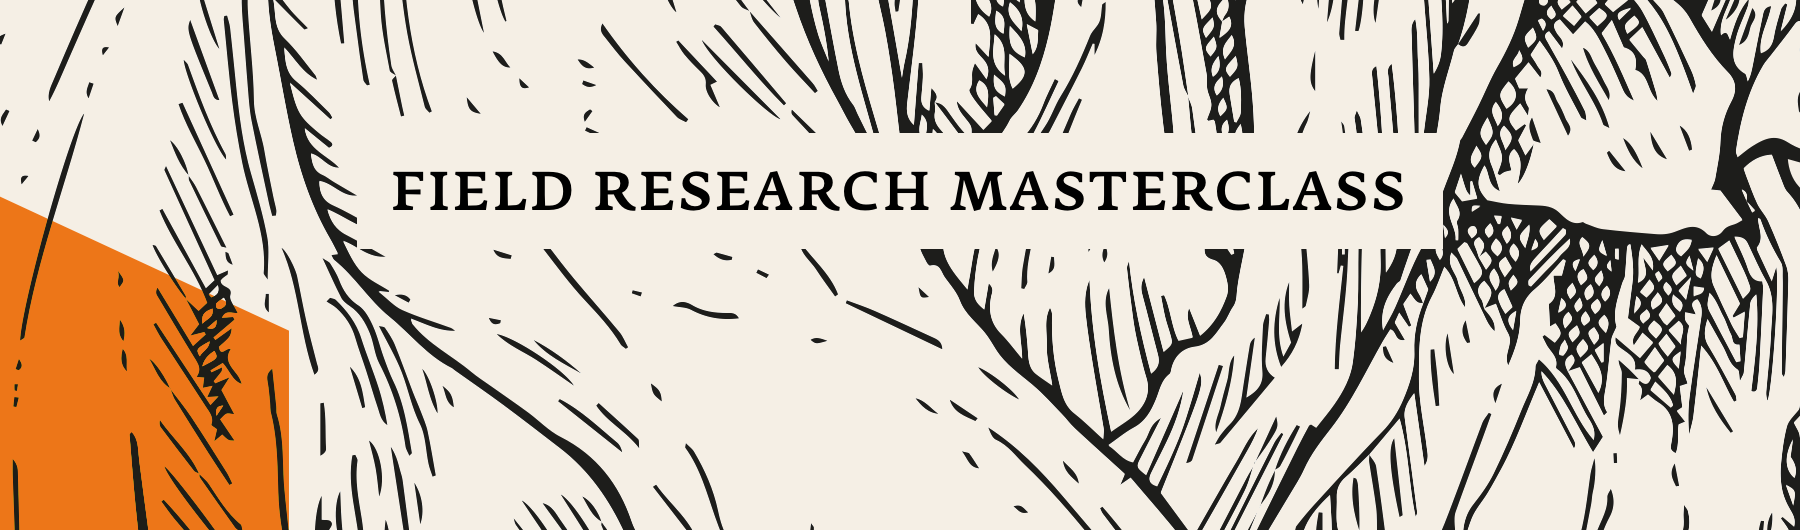 April 24, Field Research Masterclass, Shanghai